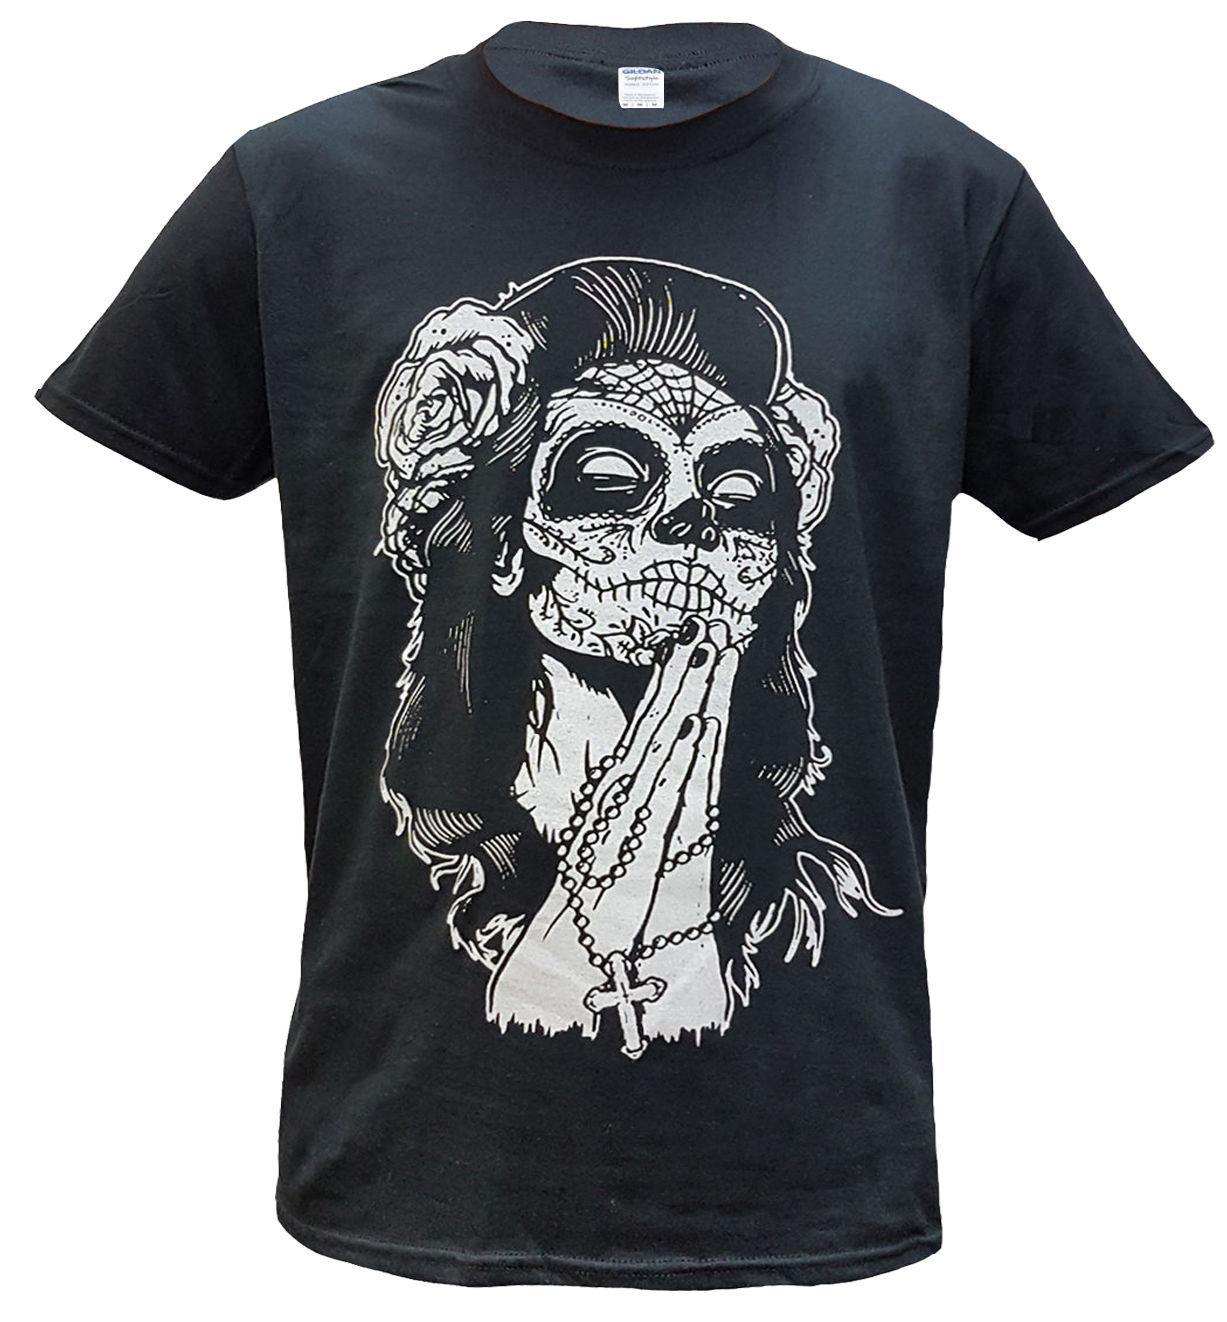 Compre Camiseta De Algodón Con Calavera Mexicana Tatuaje Calavera